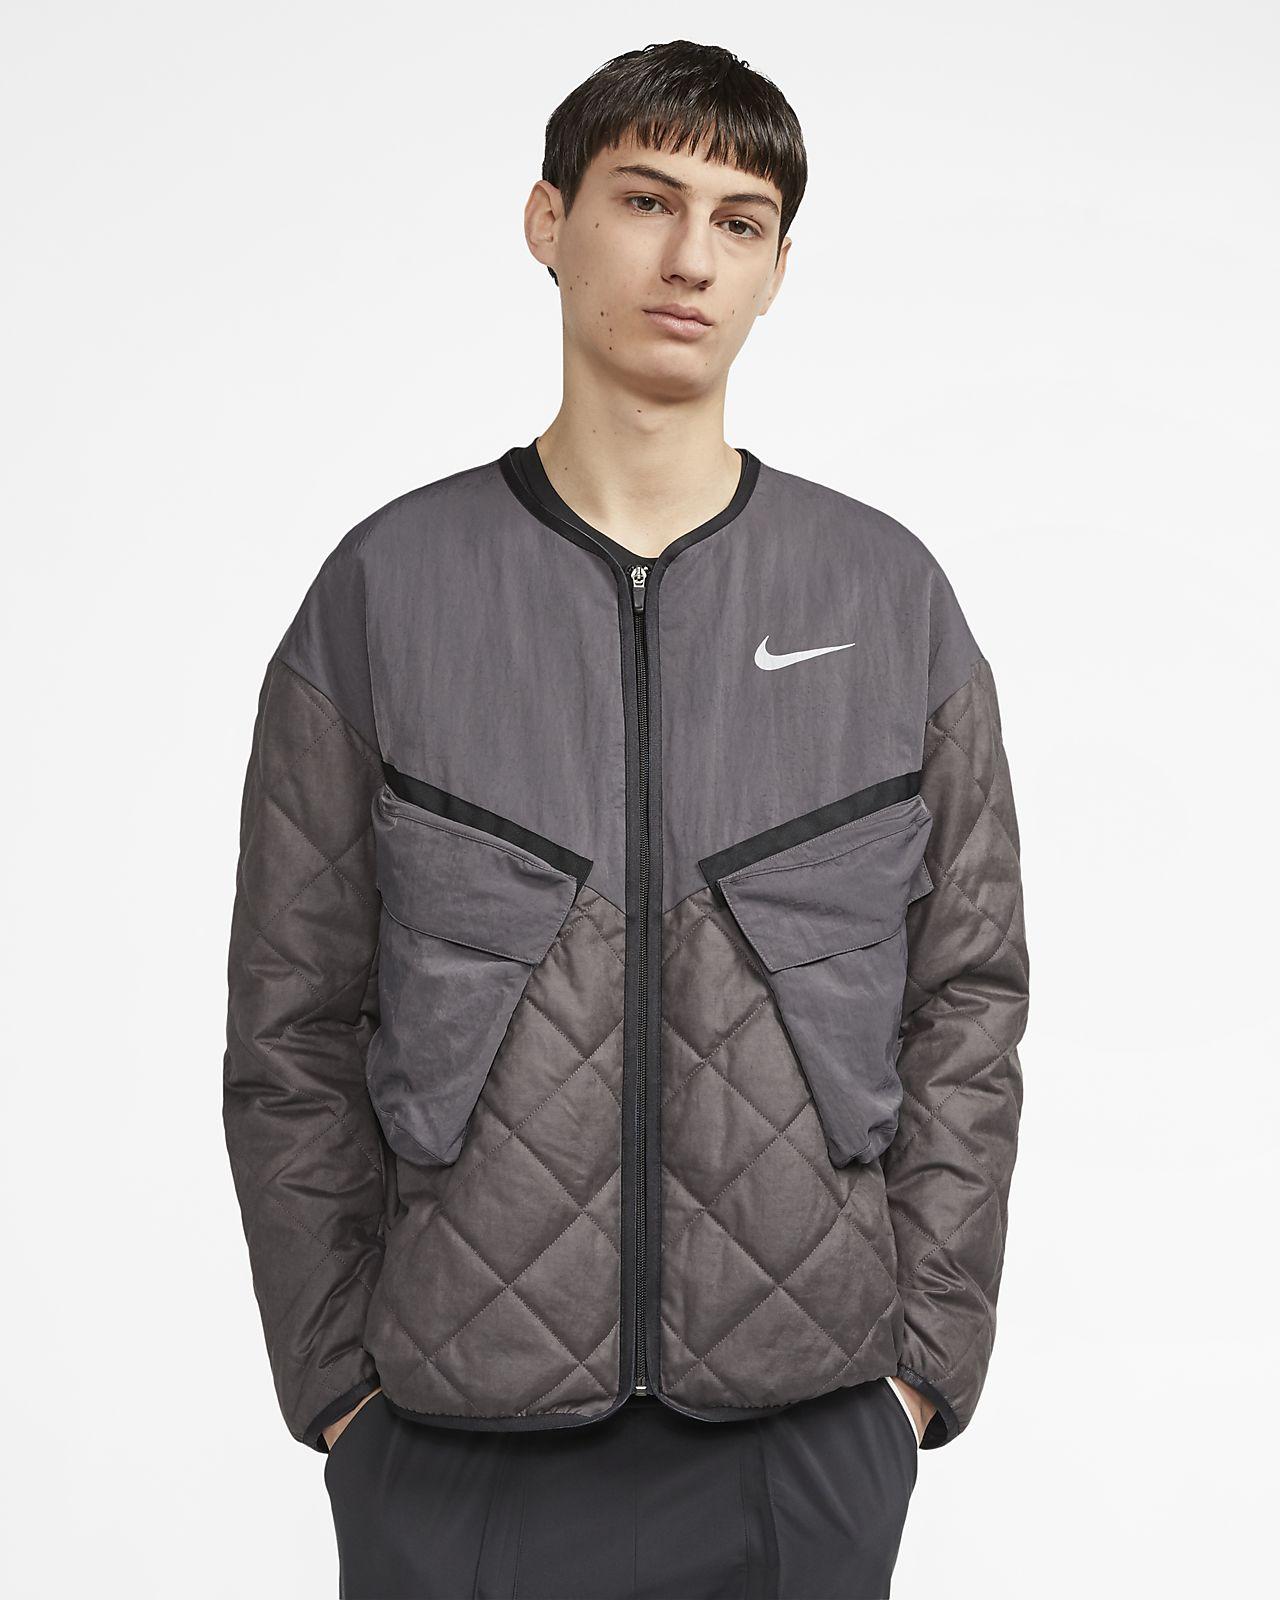 Nike Run Ready 男子夹克